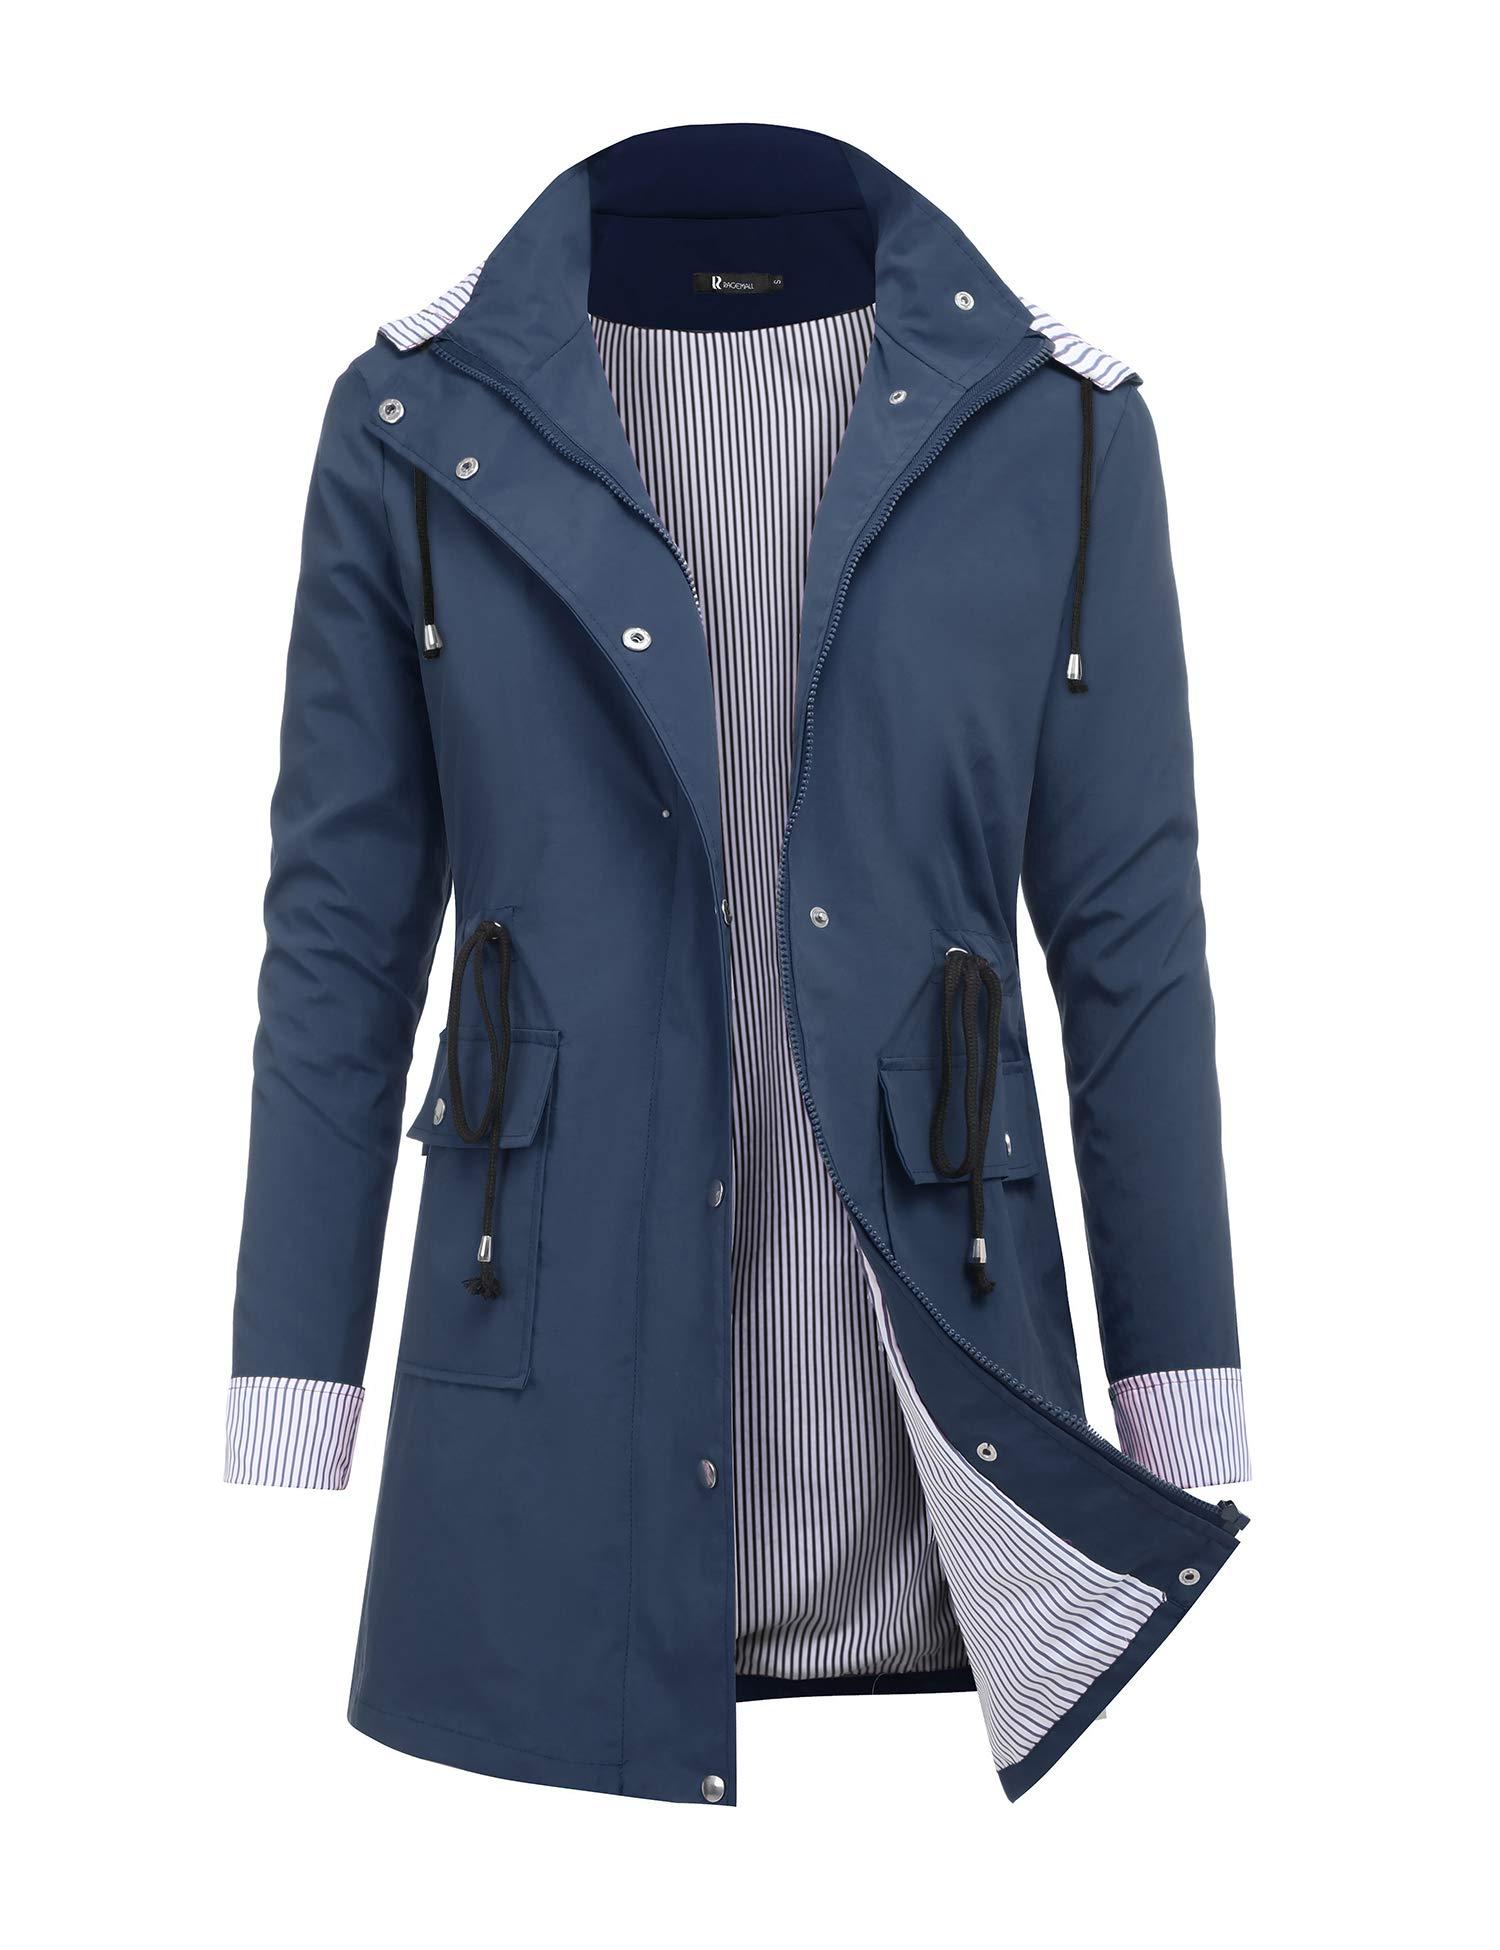 RAGEMALL Women's Raincoats Windbreaker Rain Jacket Waterproof Lightweight Outdoor Hooded Trench Coats navyblue XL by RAGEMALL